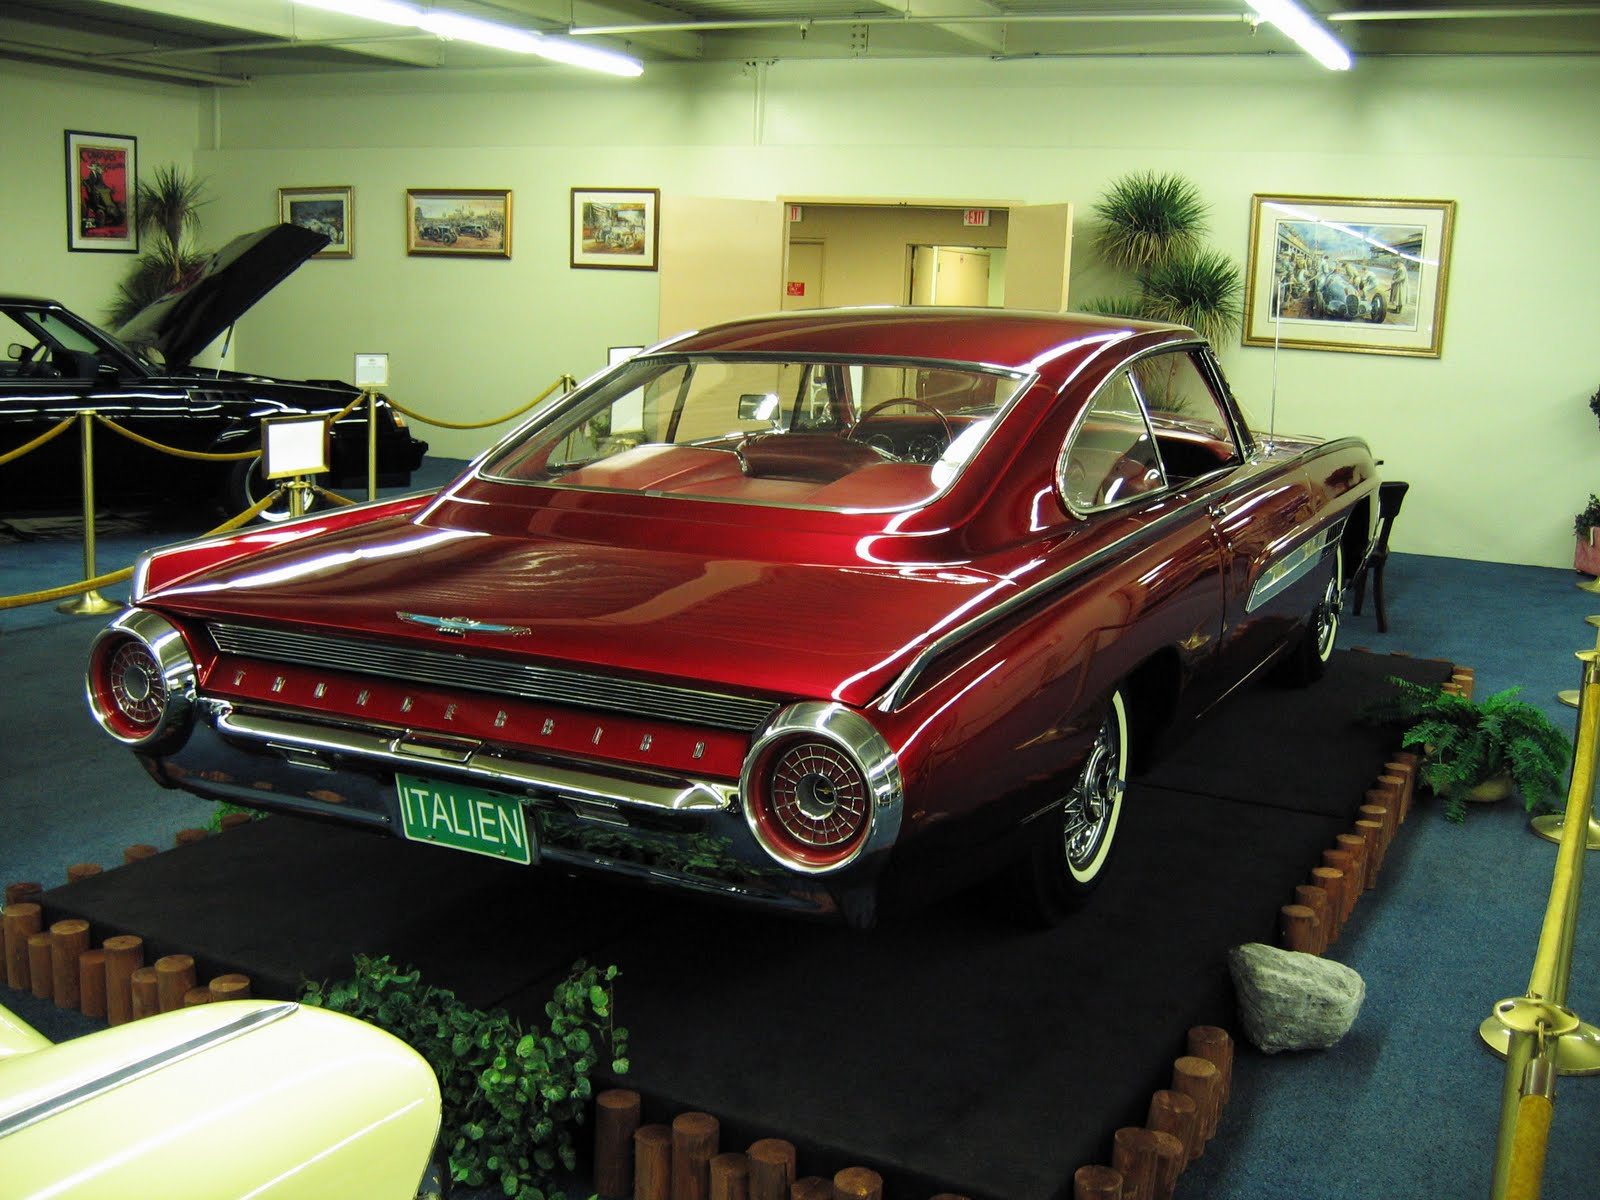 Las Vegas Imperial Palace Auto Car